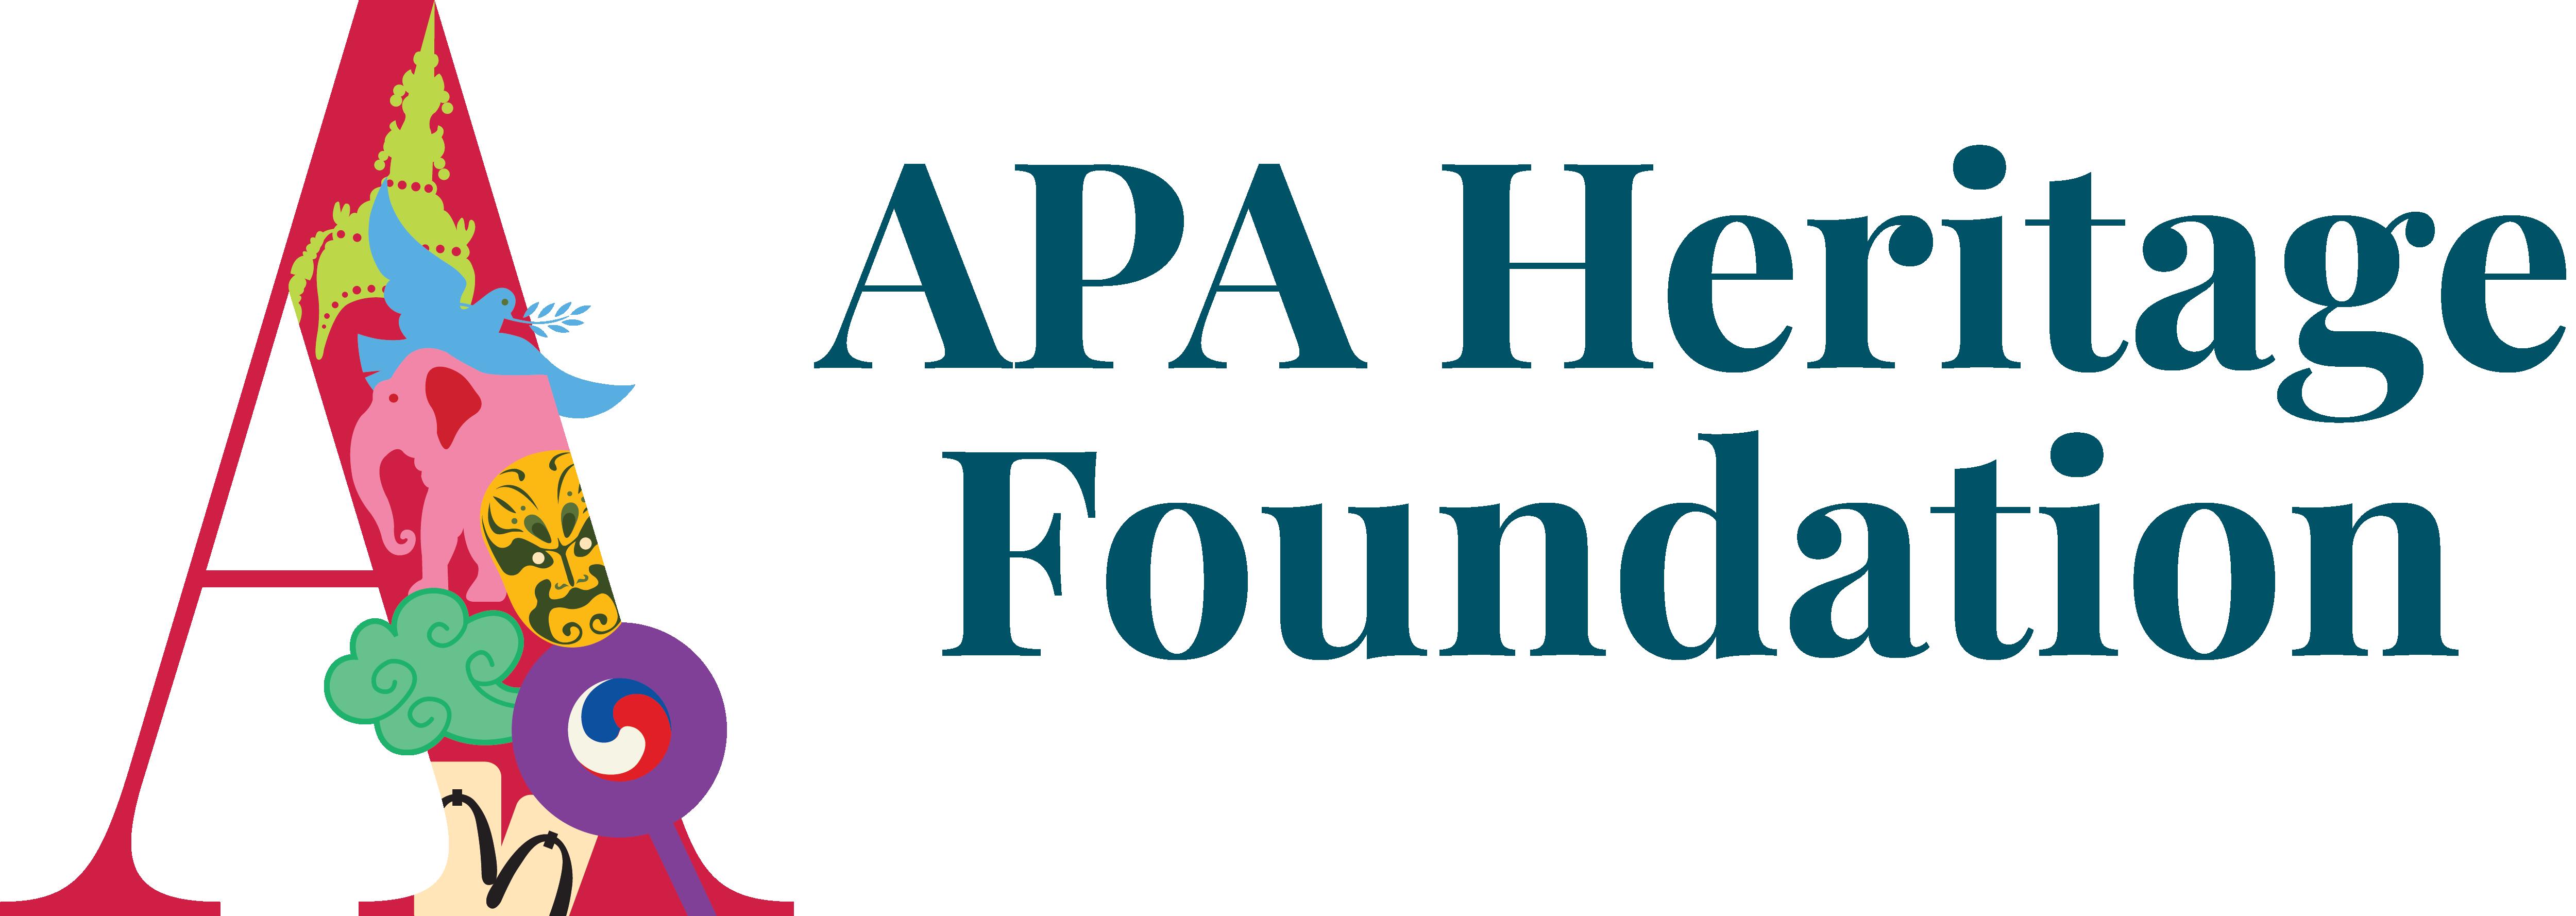 APA Heritage Foundation logo